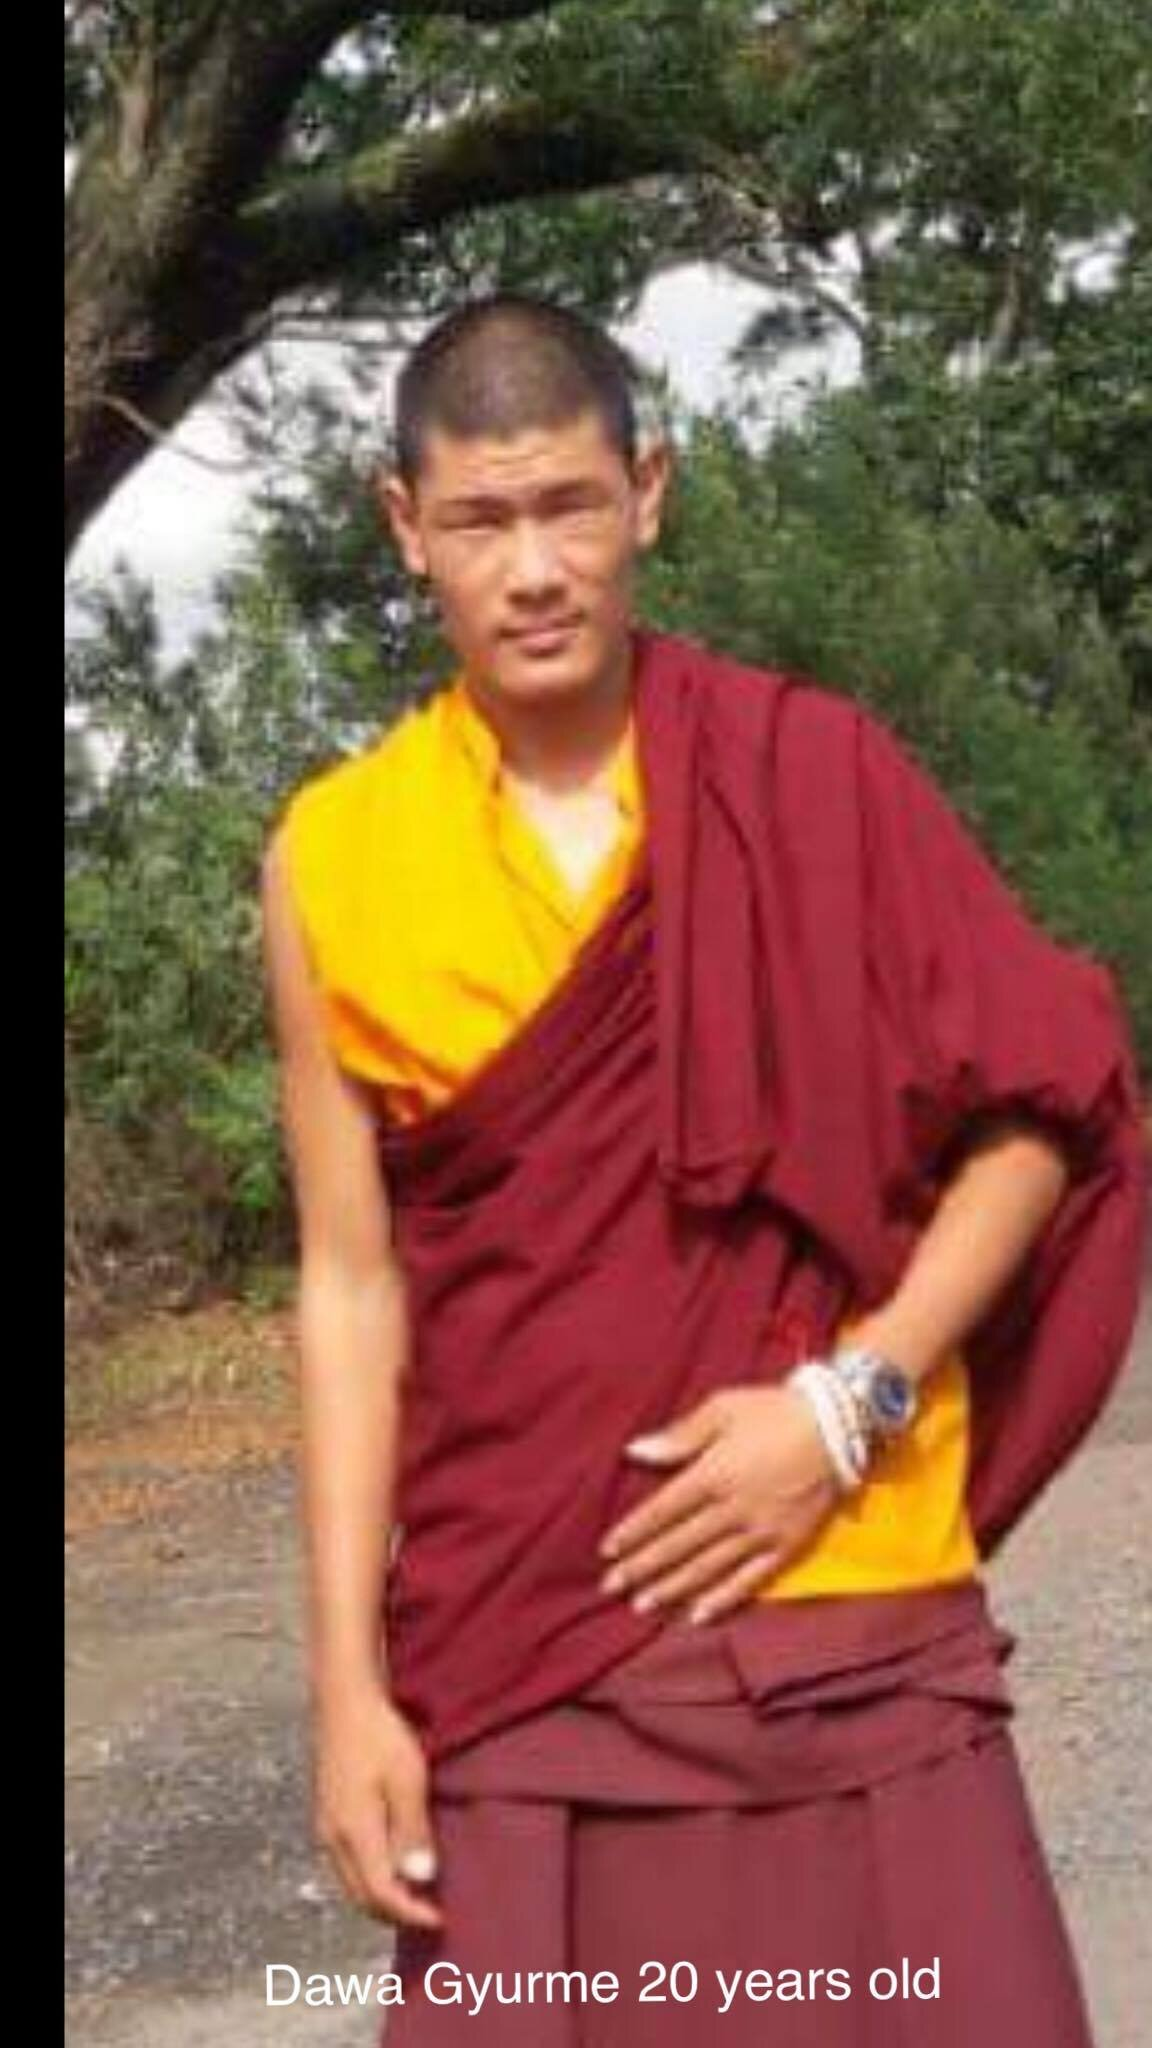 Monk_Dawa_Gyurme_20yrs_old.jpg